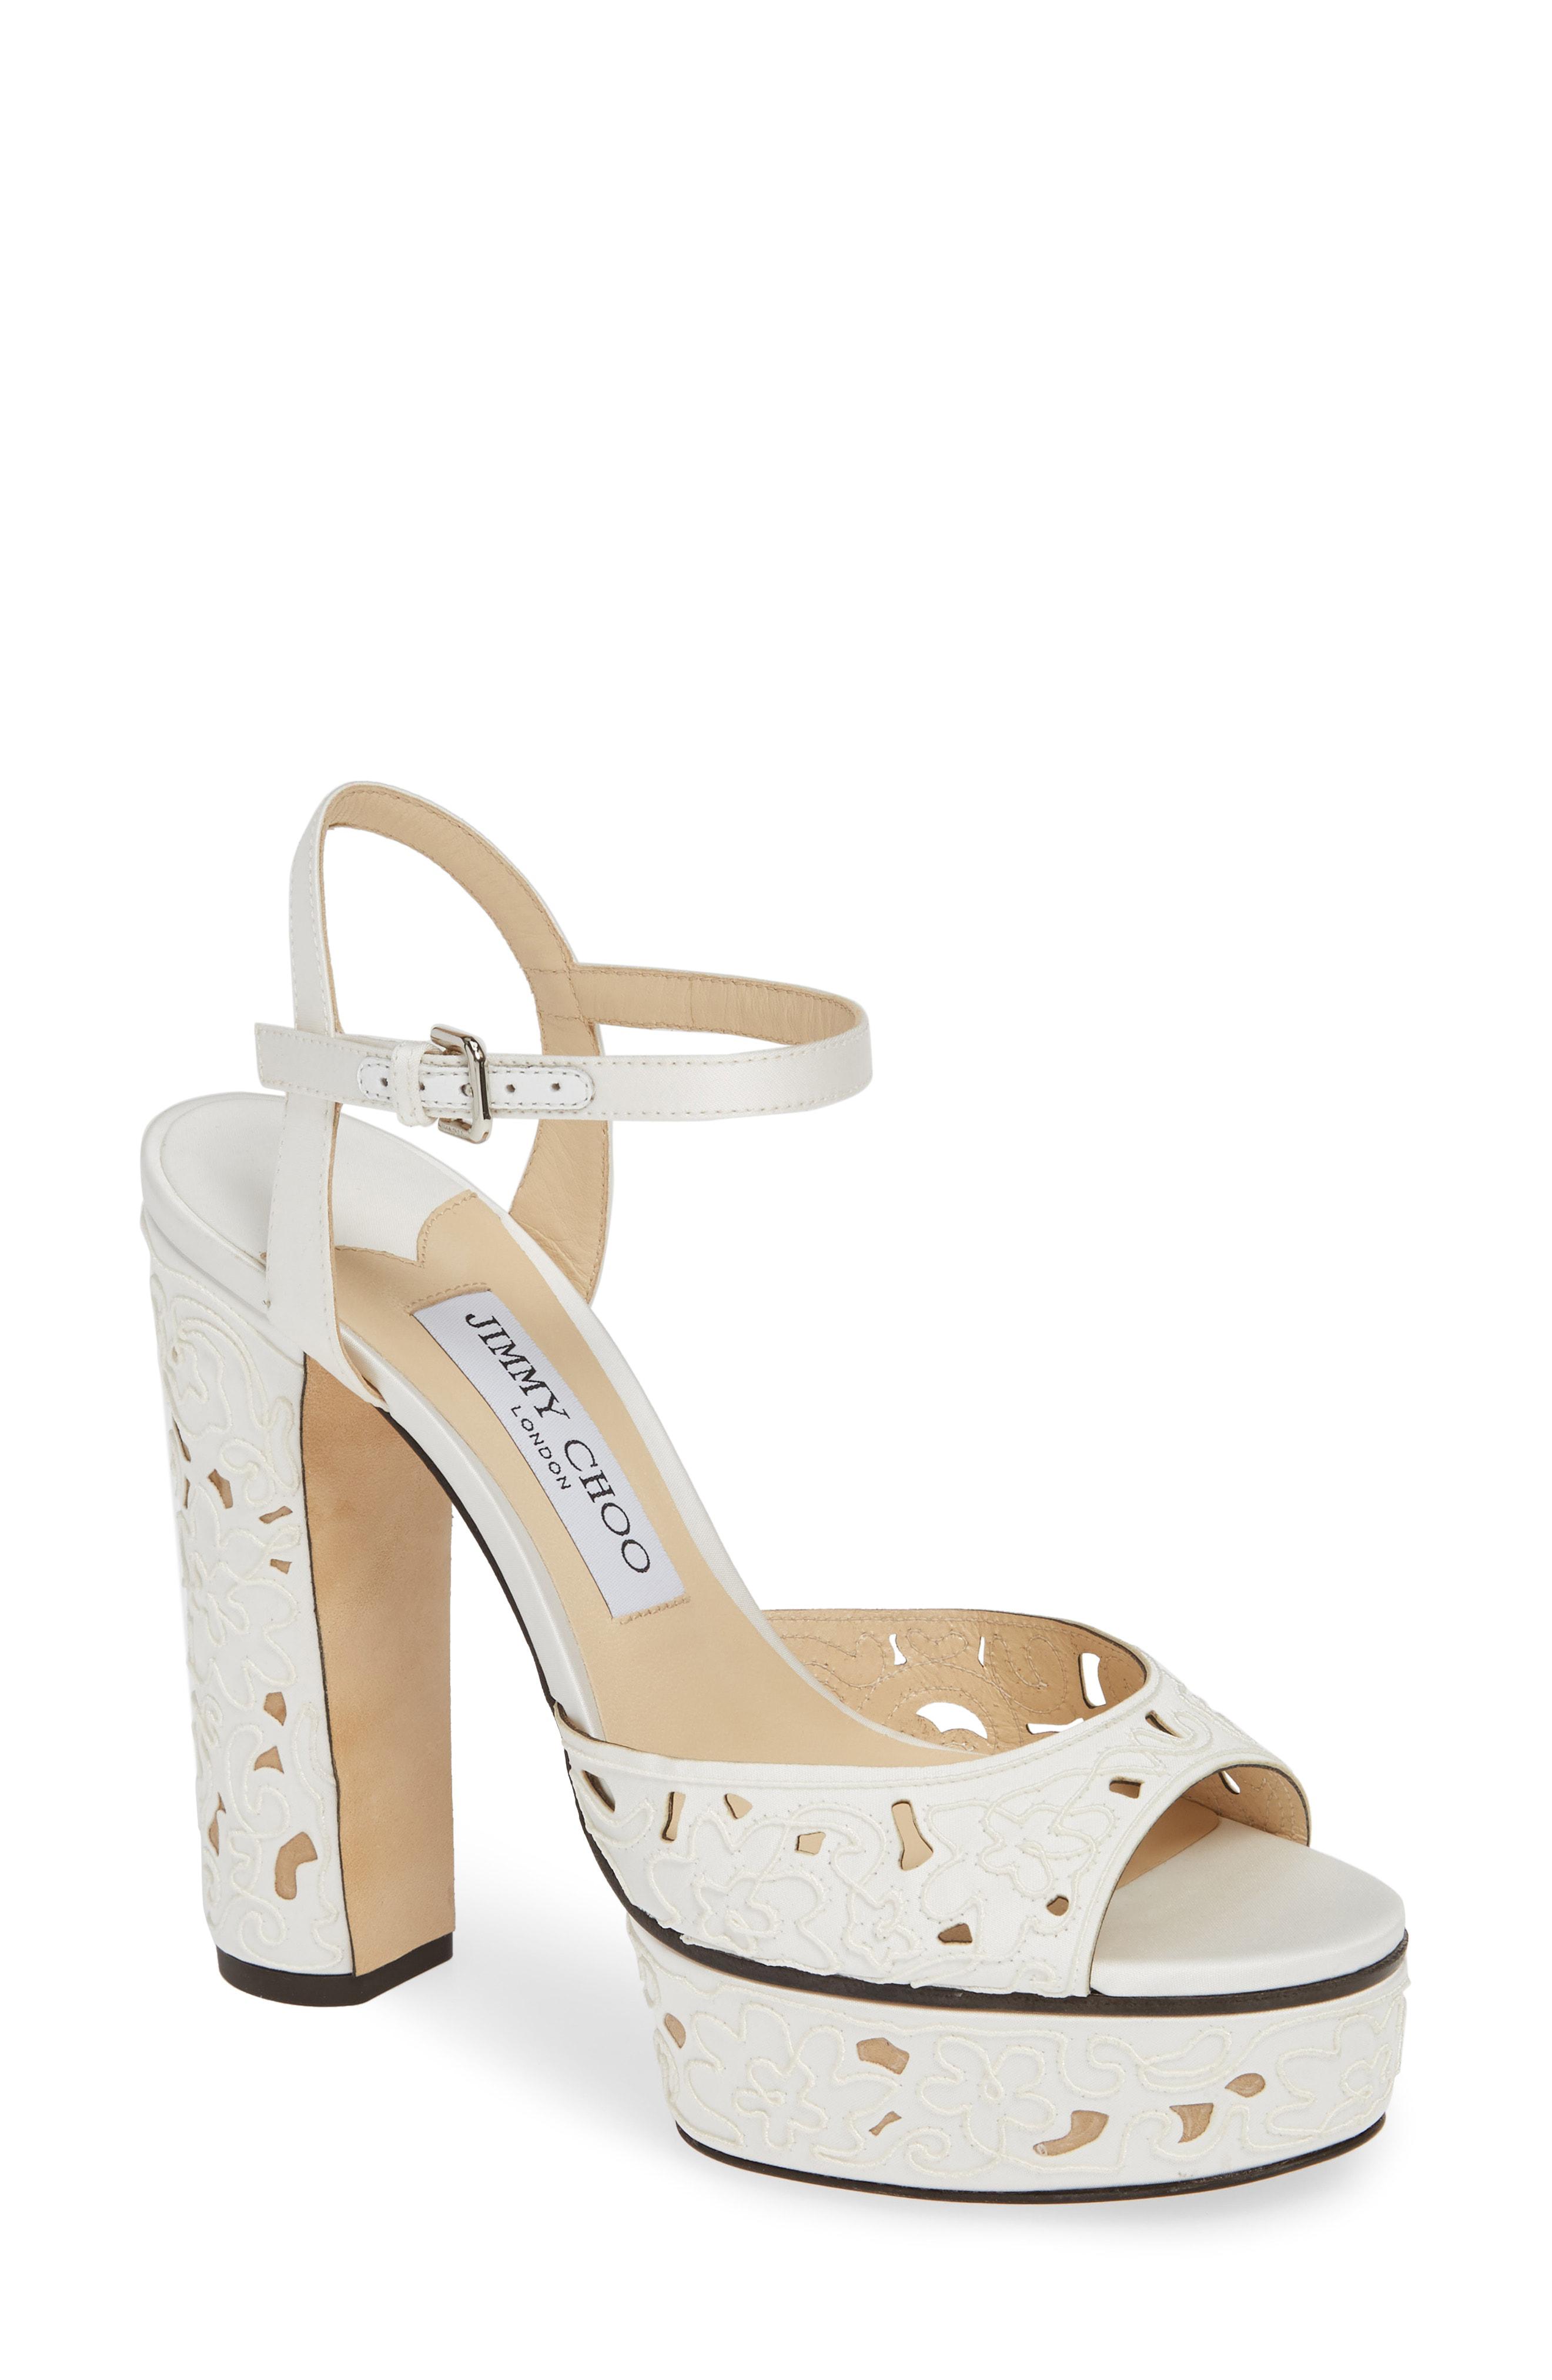 d3bf6d37dc1 Jimmy Choo Peachy Cutout Platform Sandals In White